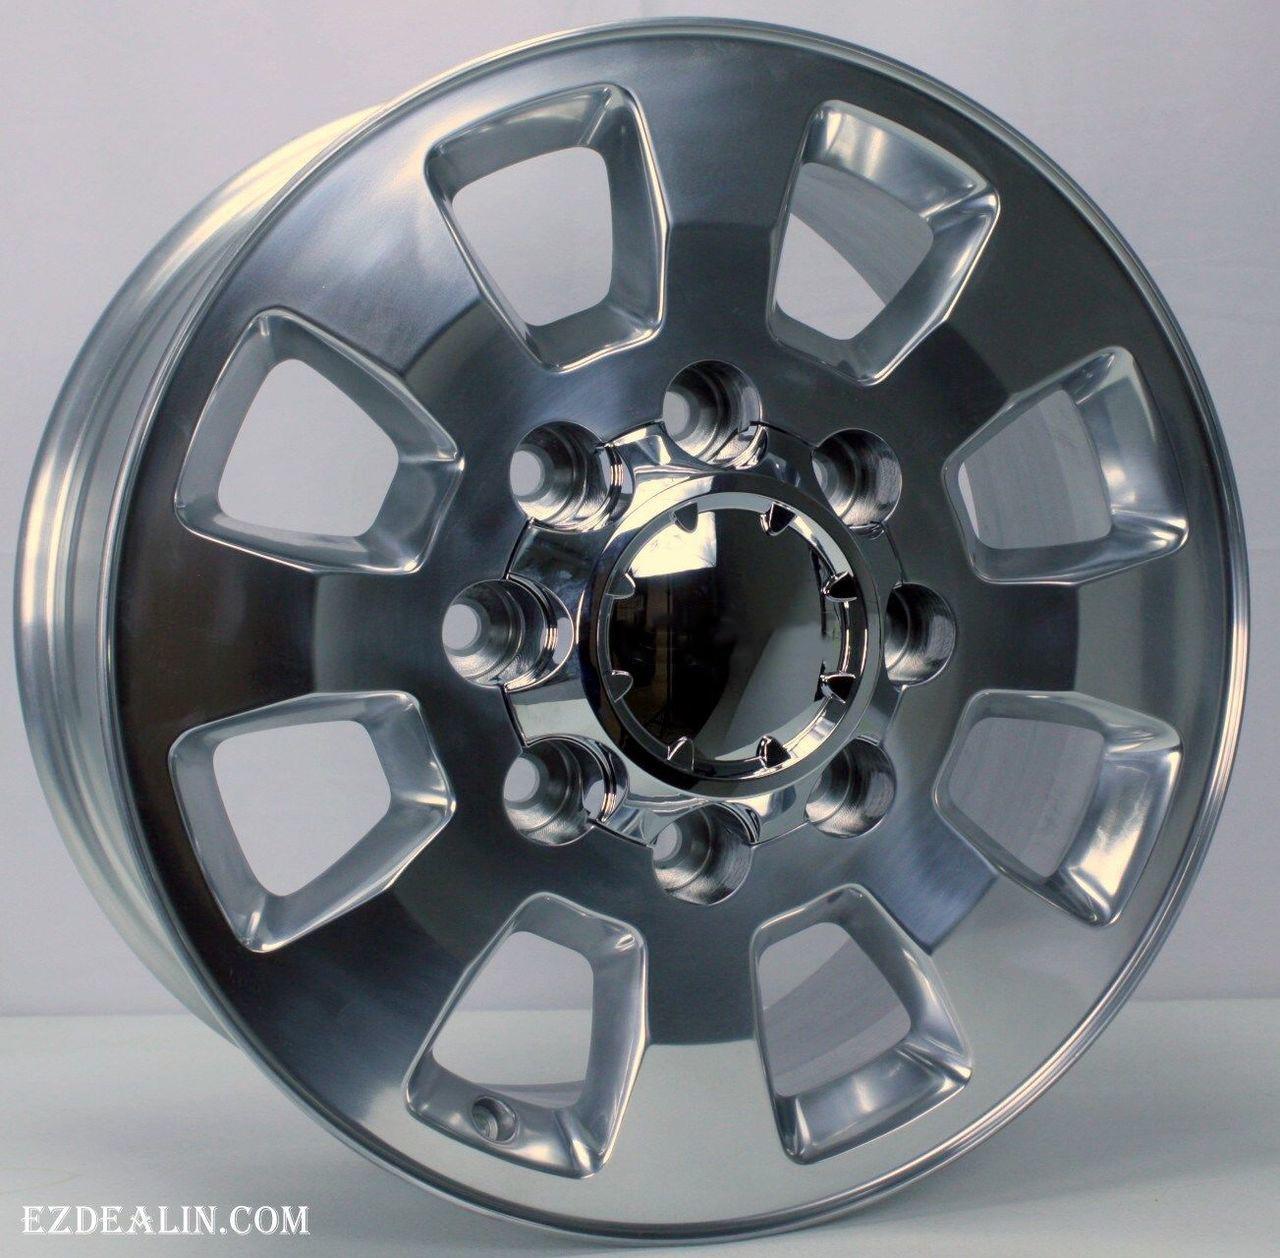 Gmc 2500 3500 Hd Sierra Denali 2011 2018 Polished Aluminum 18 8 Lug Wheels Rims 8 180